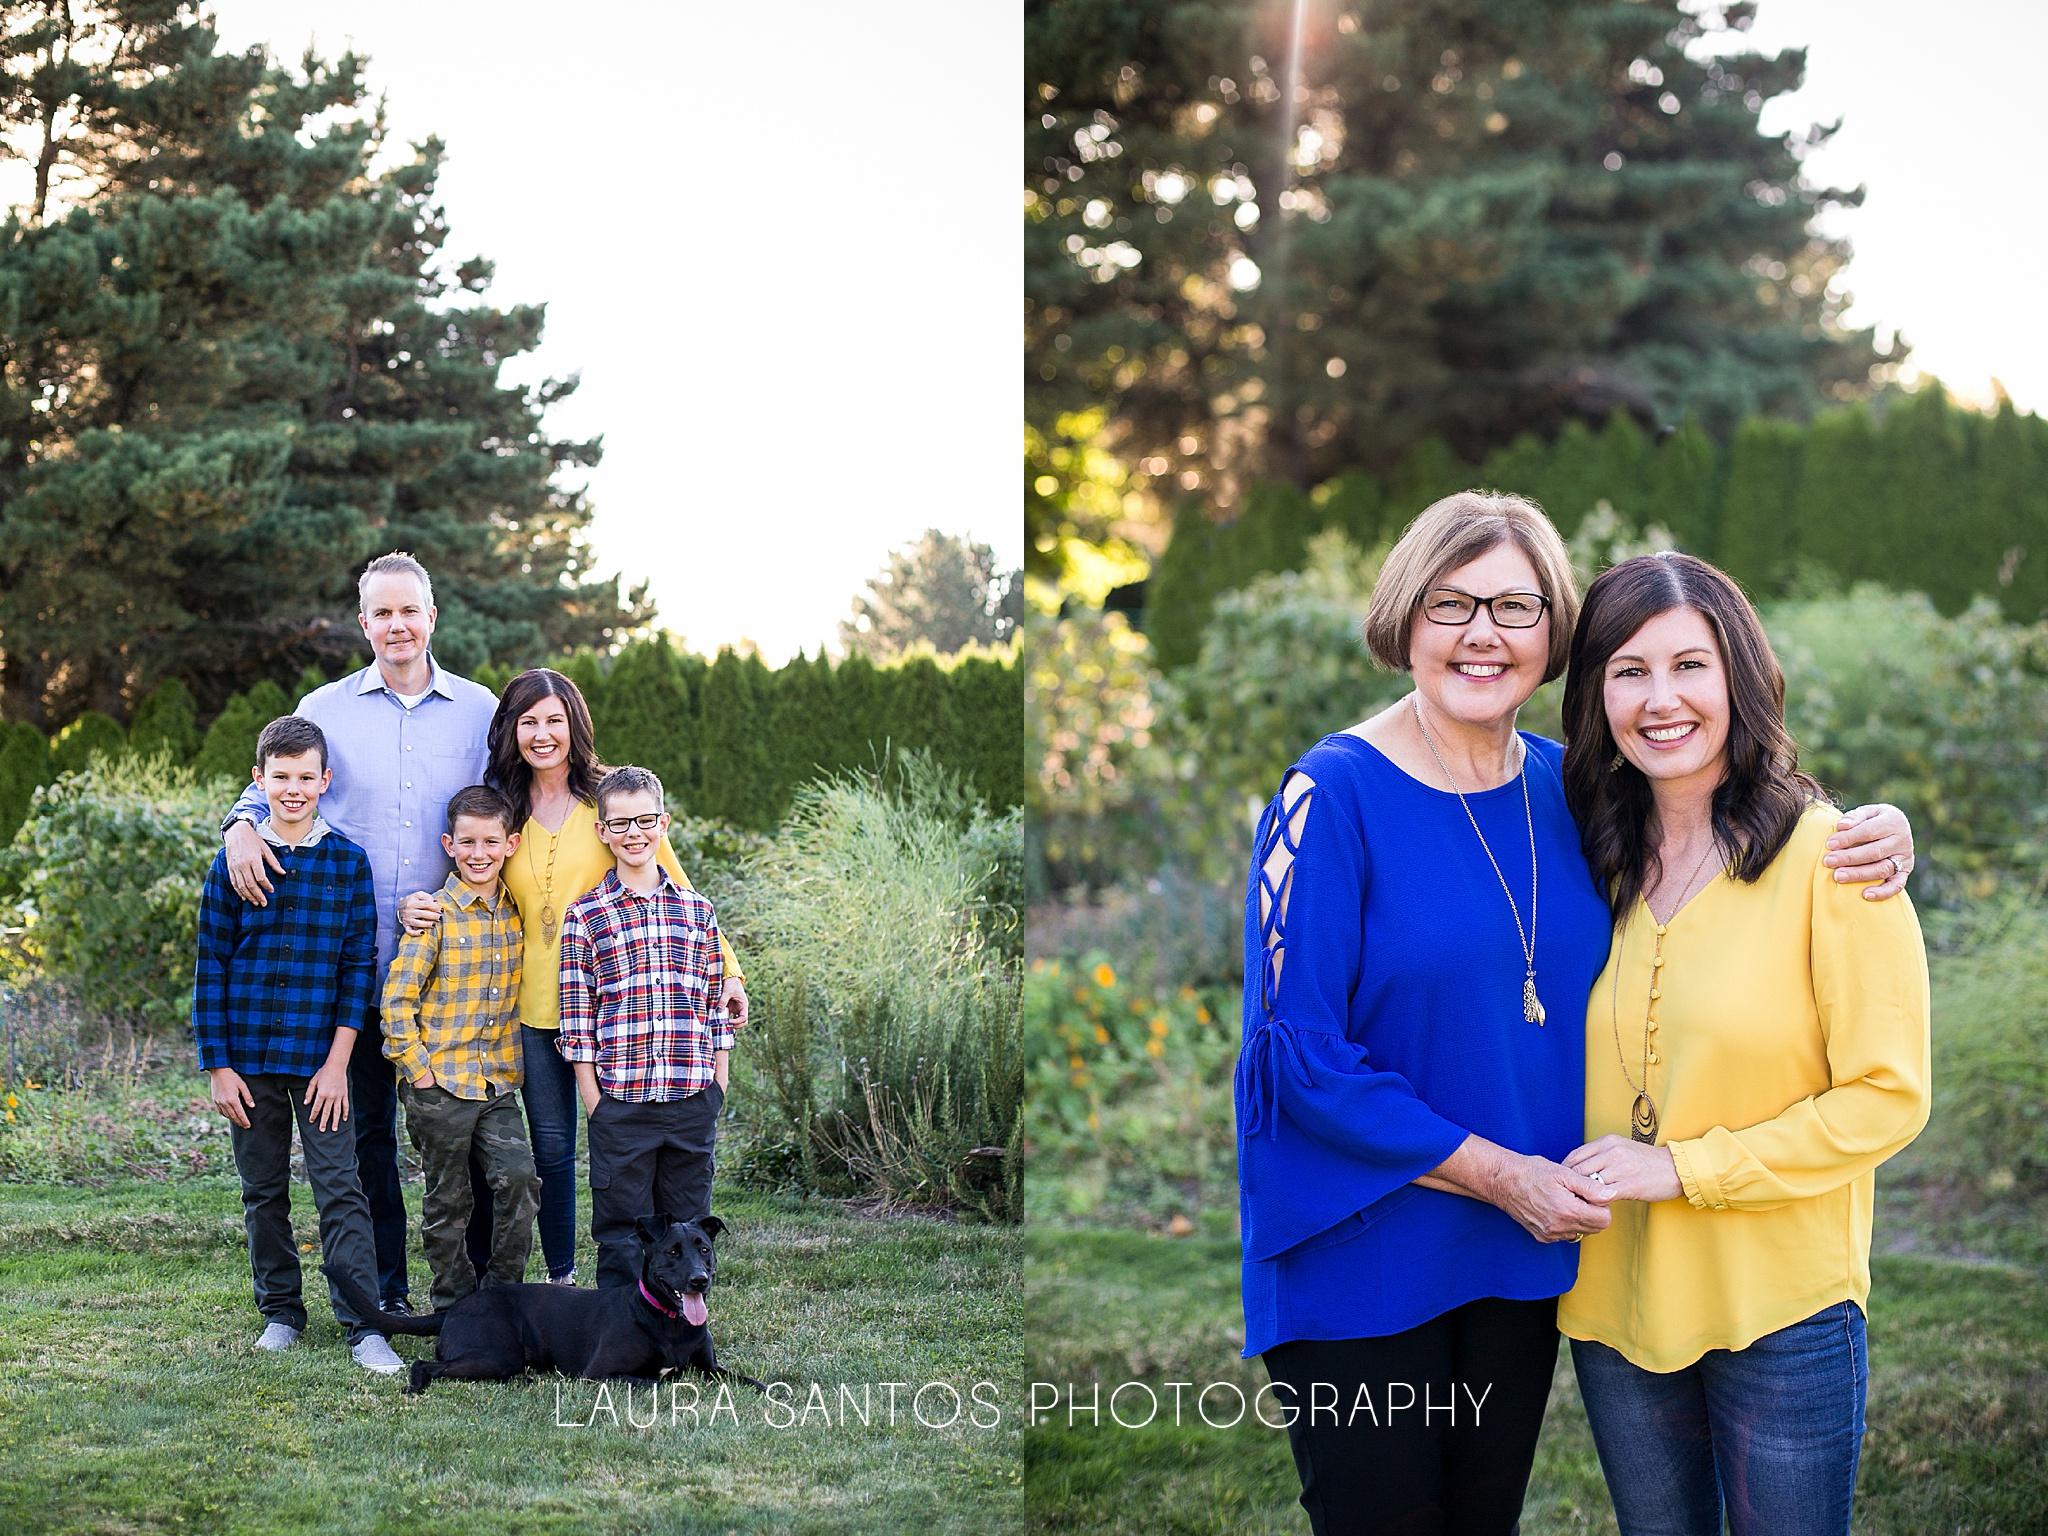 Laura Santos Photography Portland Oregon Family Photographer_0716.jpg